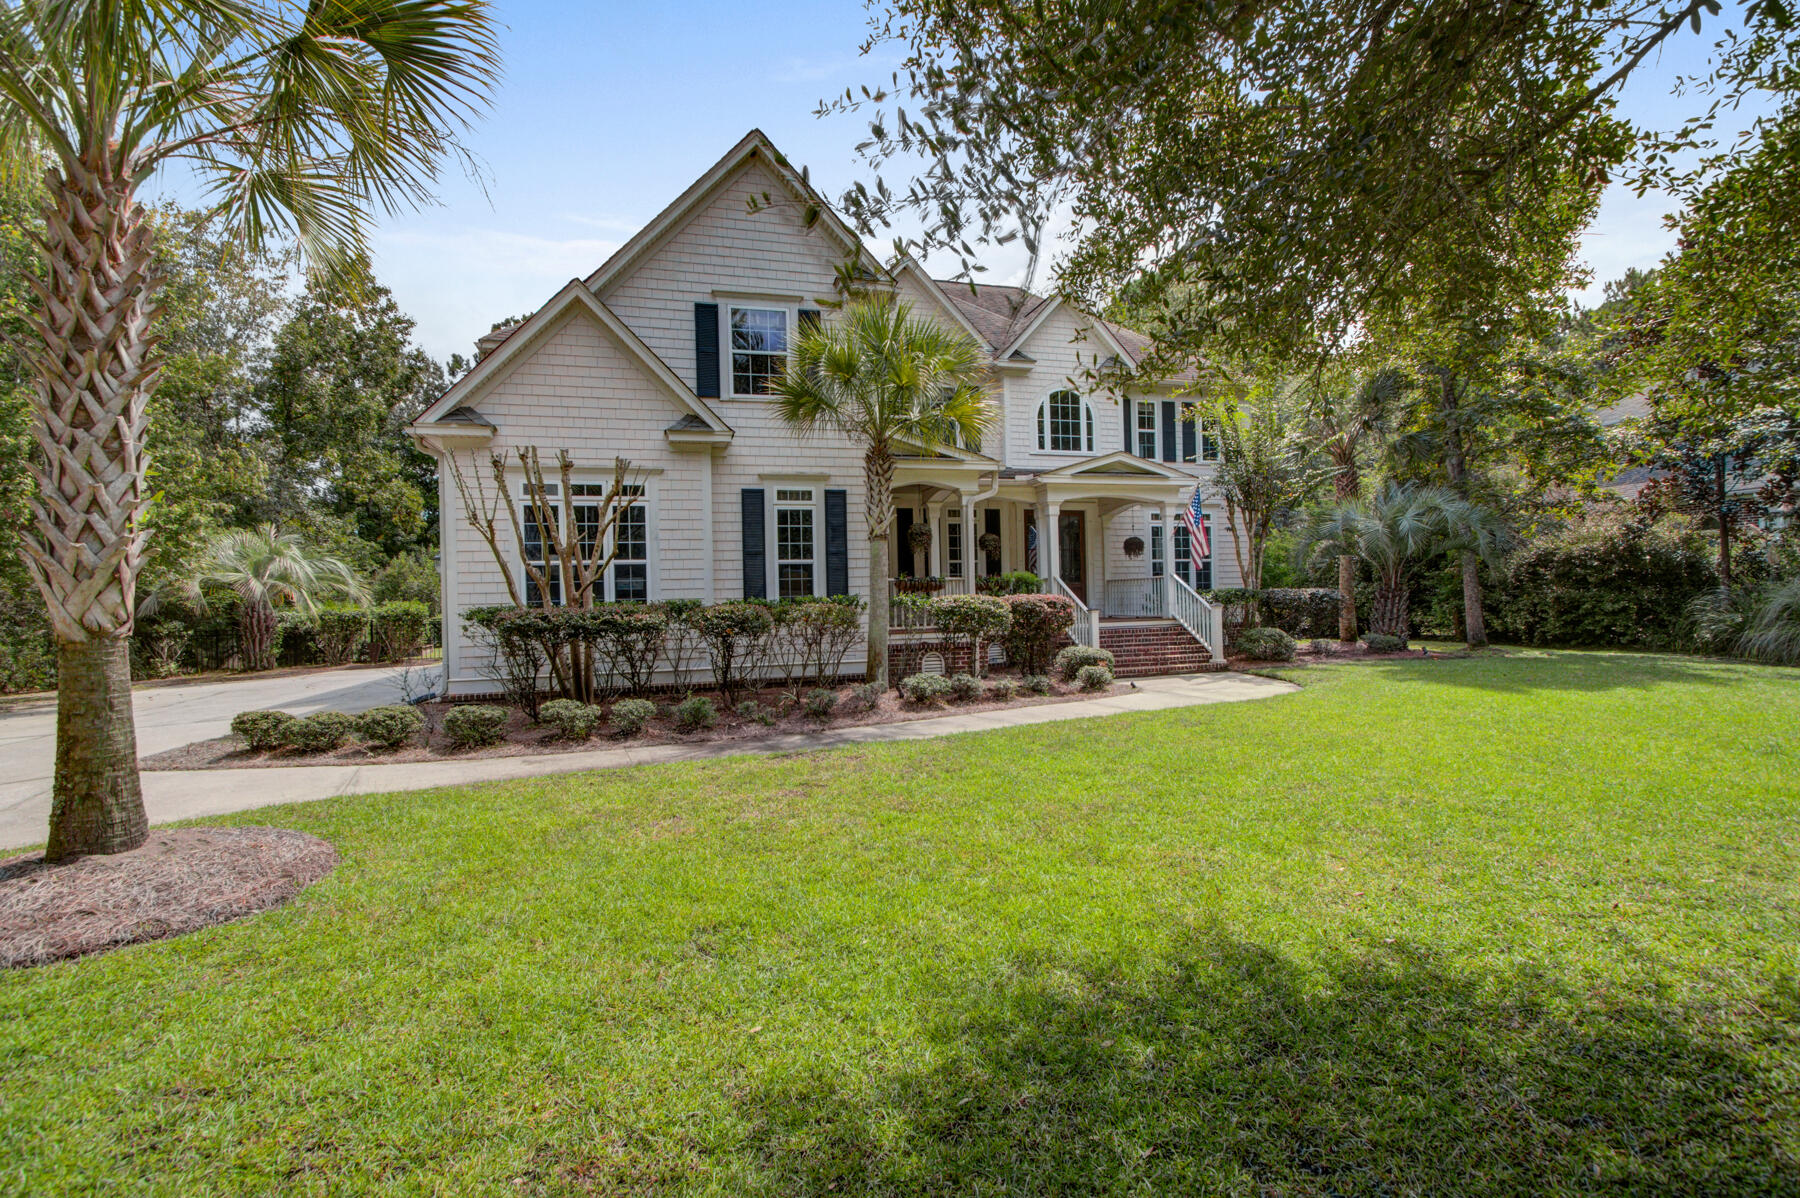 Dunes West Homes For Sale - 3095 Pignatelli, Mount Pleasant, SC - 47